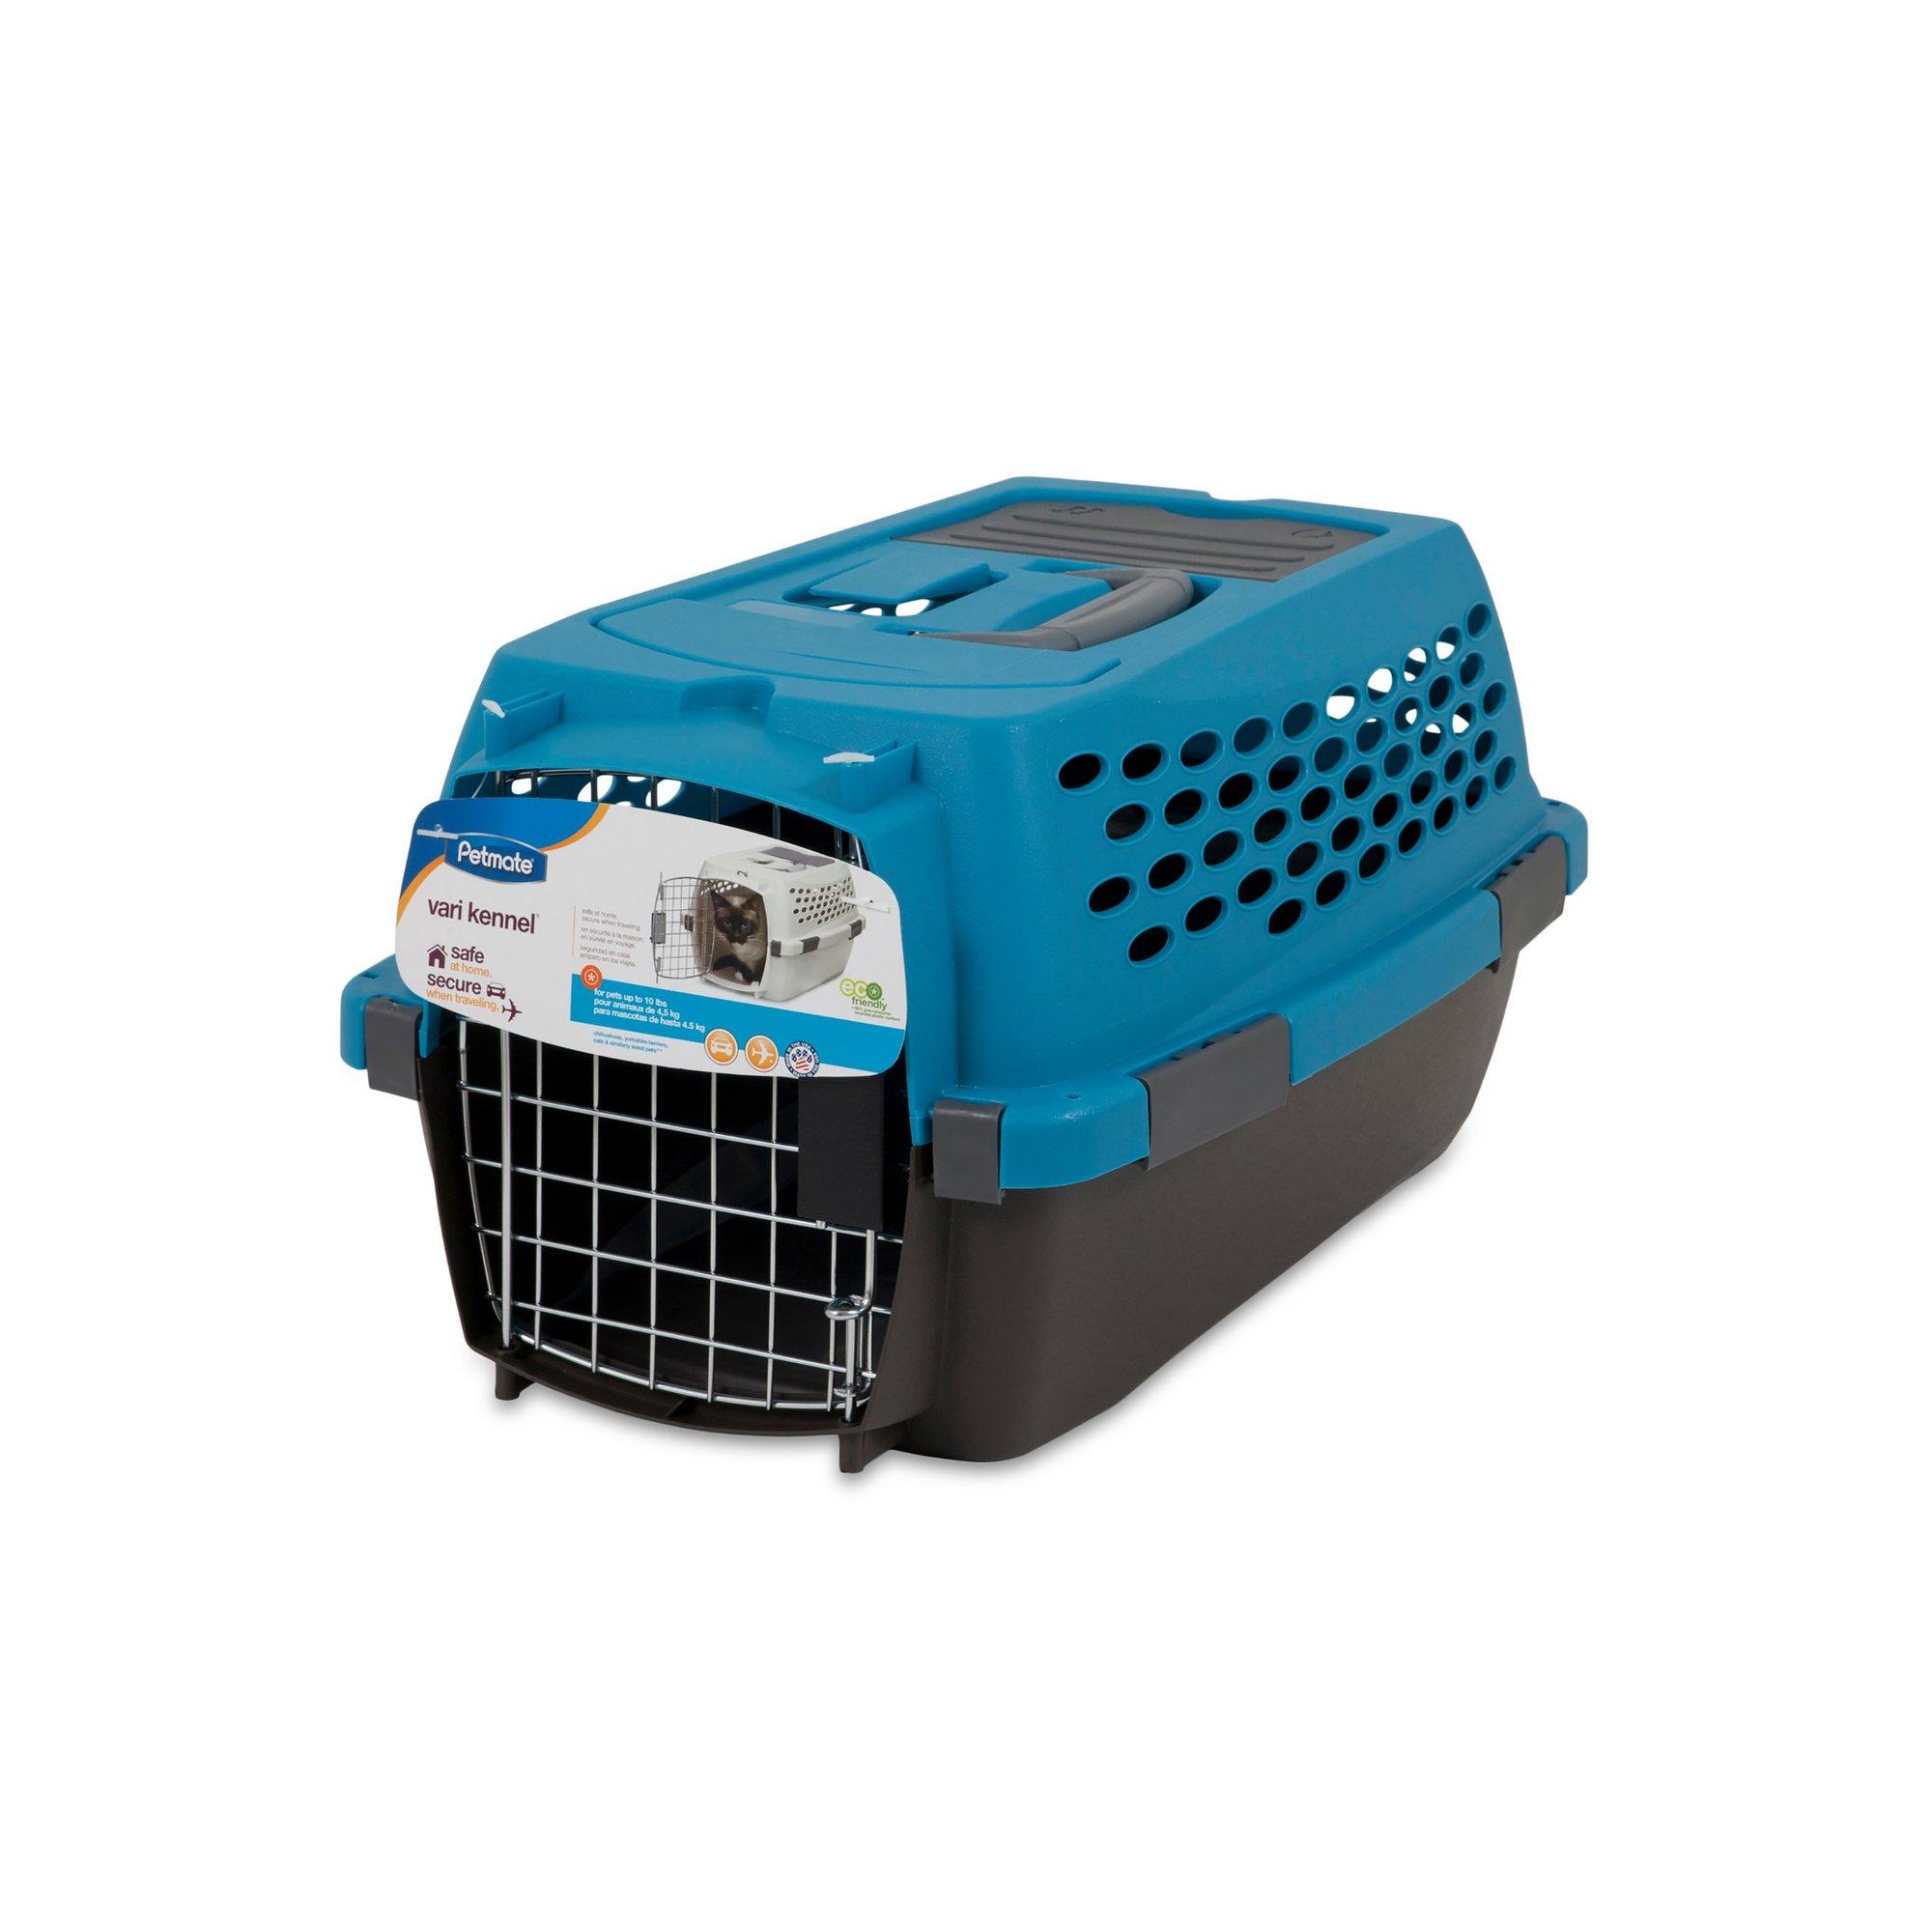 Image of Vari Kennel II Fashion Pet Carrier